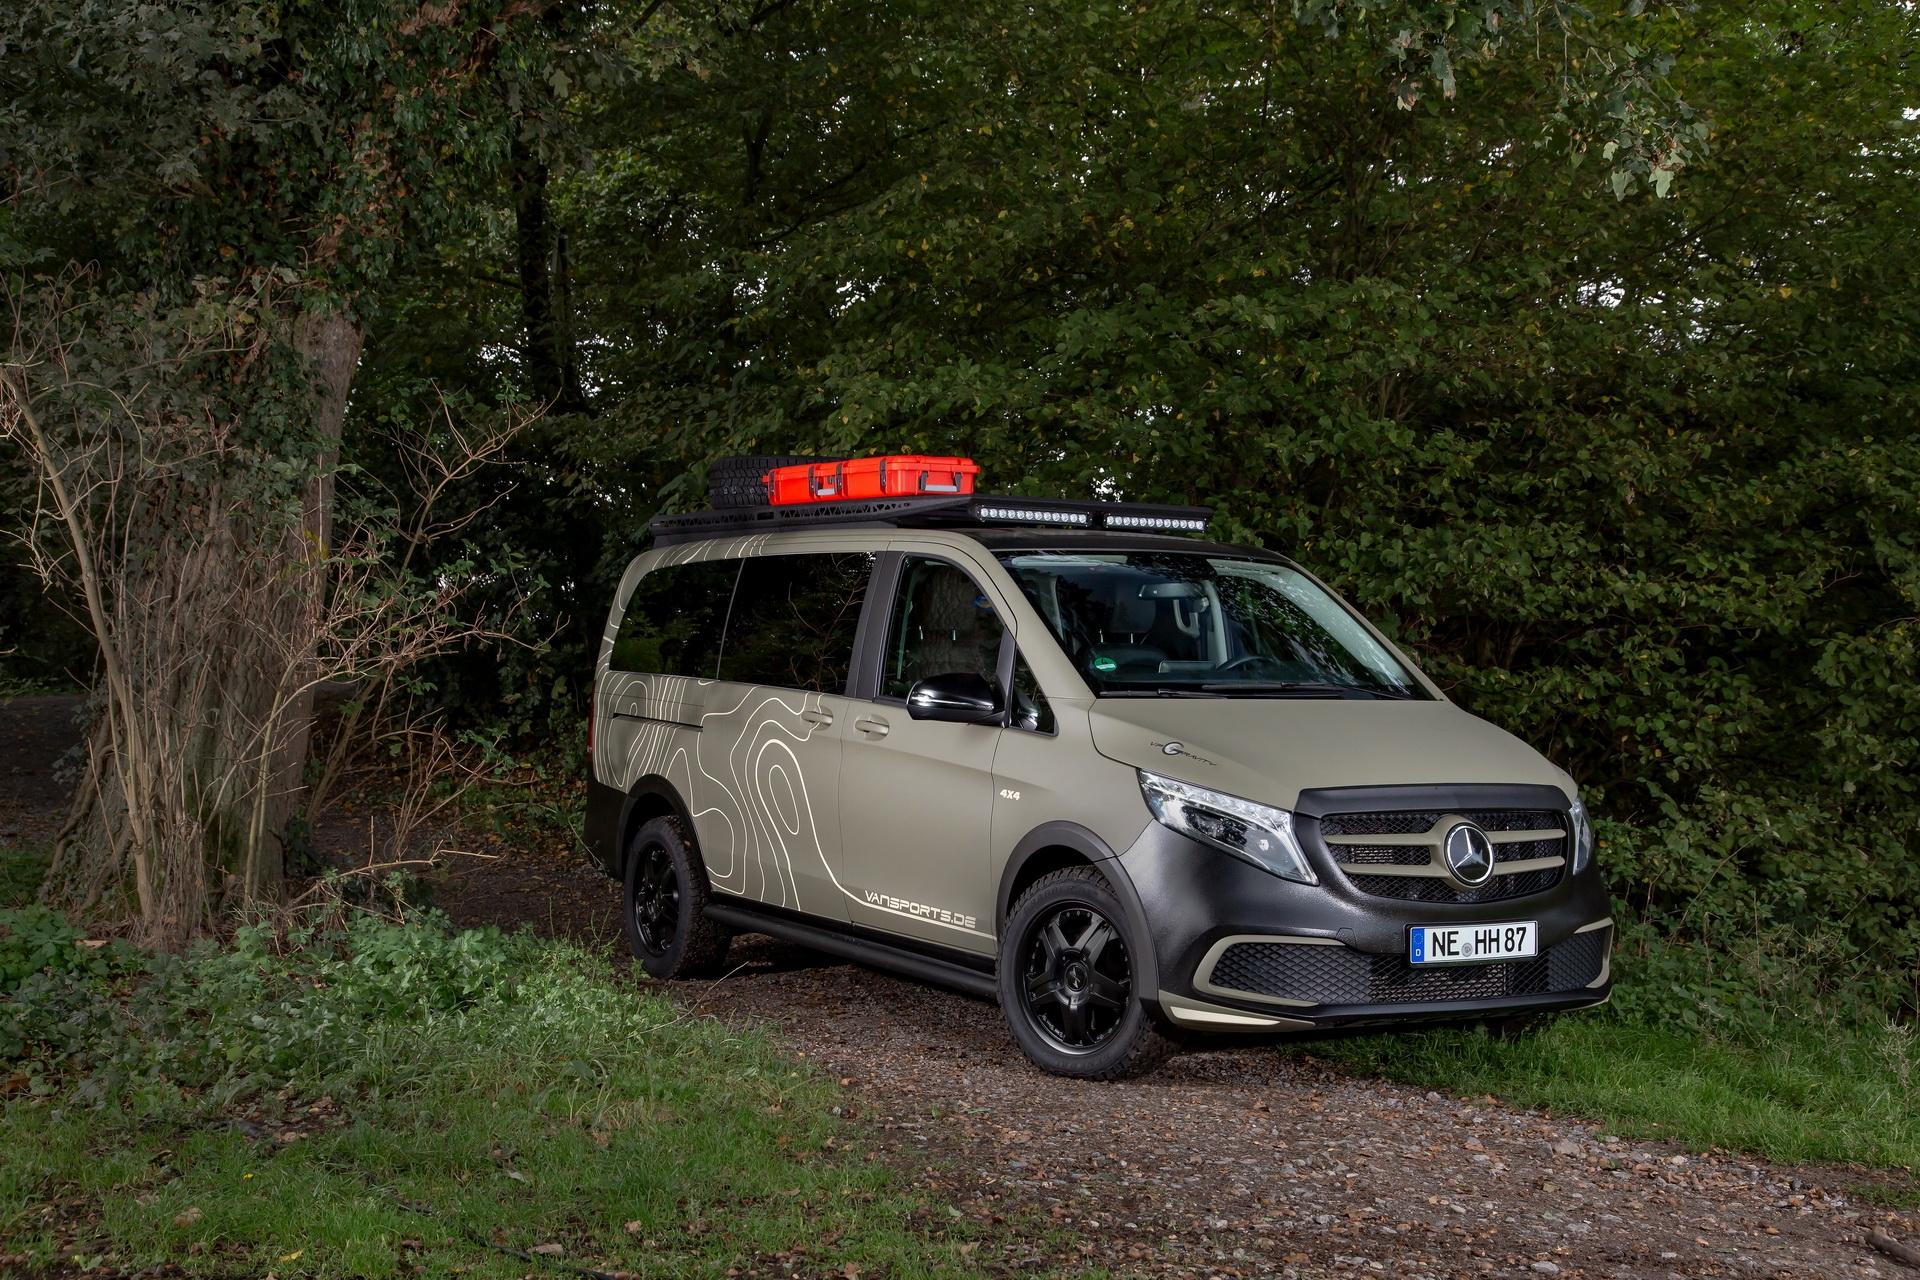 Mercedes Classe V Hartmann GeoTrek Edition